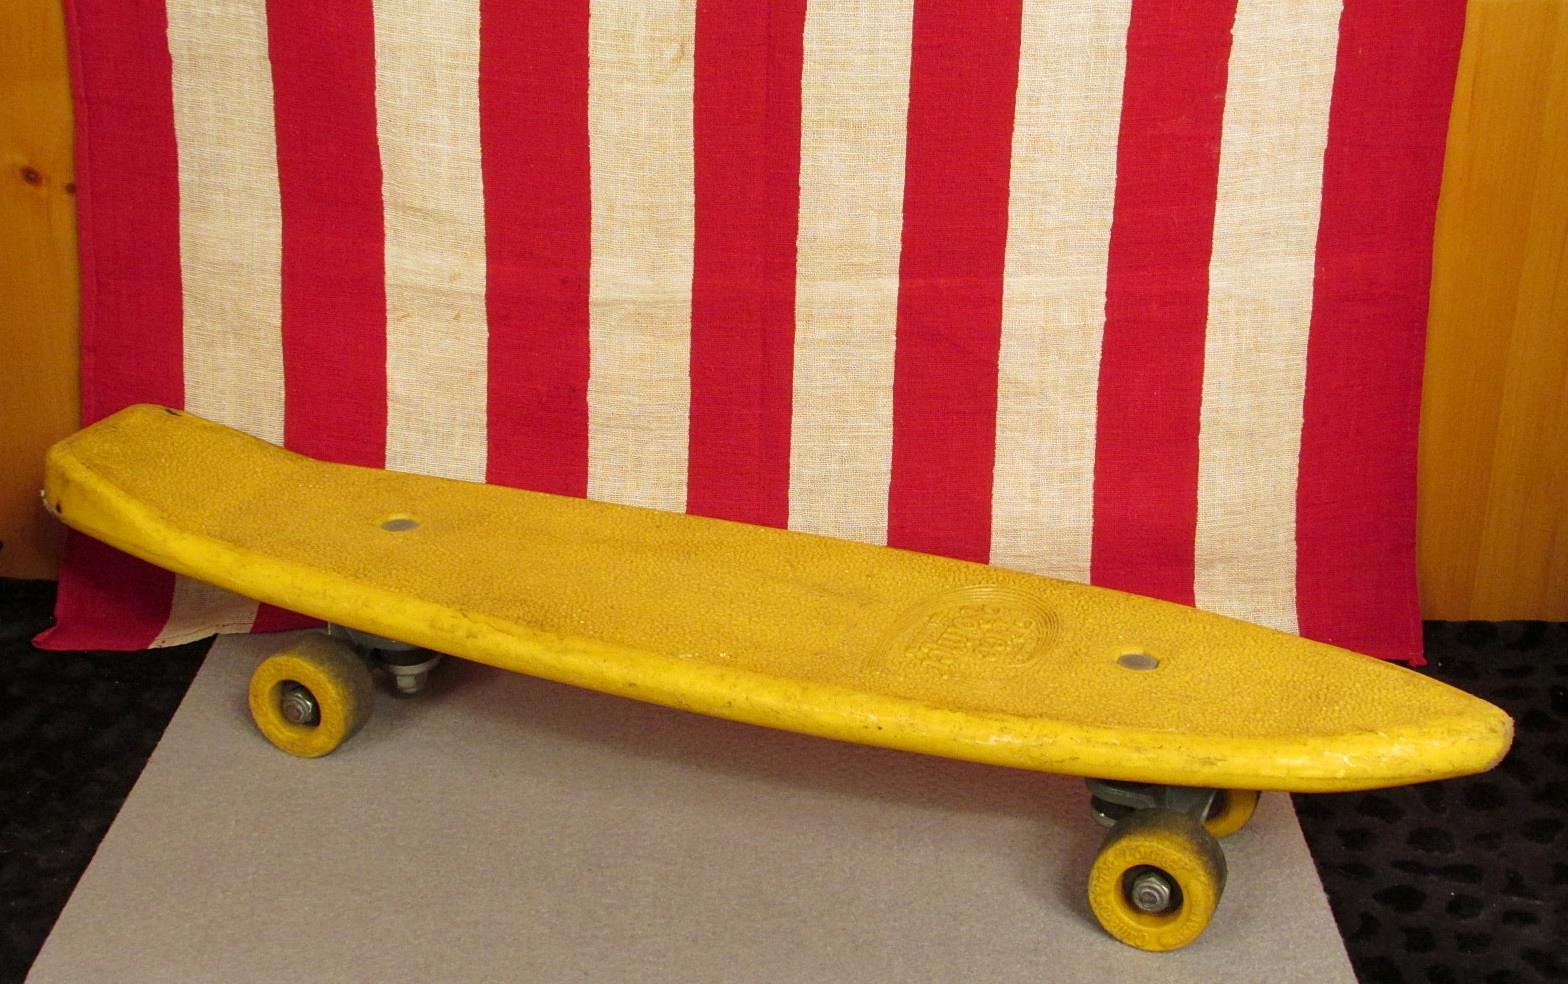 Vintage 1970s California Free Former Skateboard Plastic W ALS Trucks 23 Skate